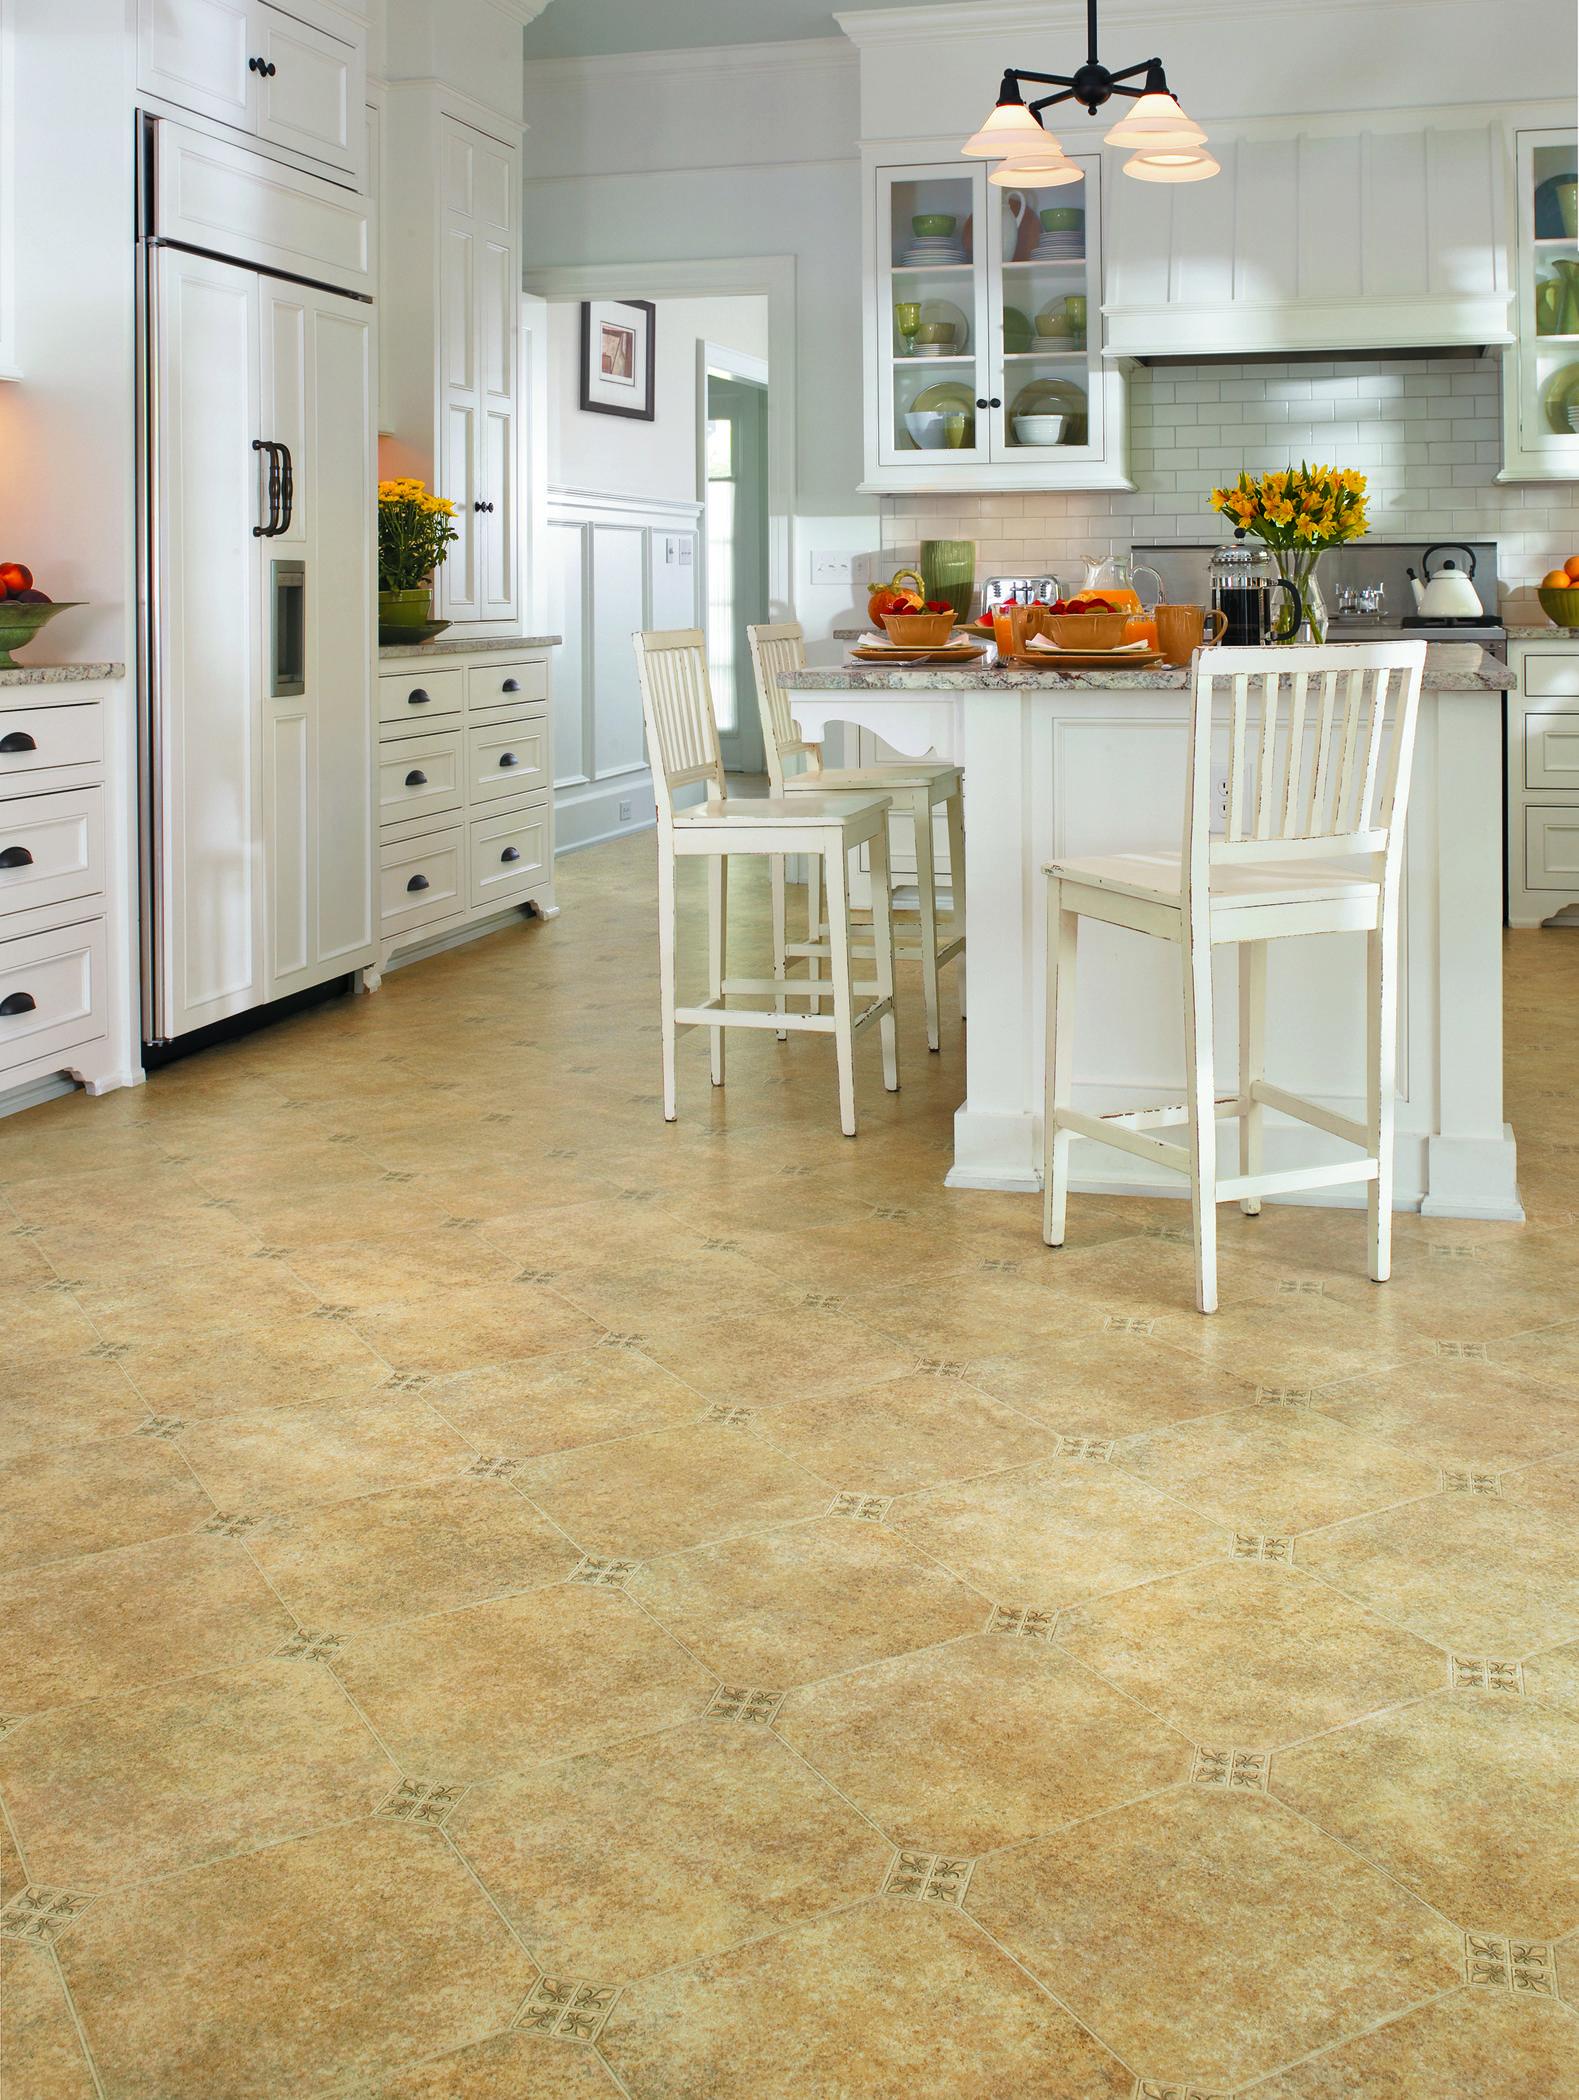 ultima nobility in royal gold kitchen remodel vinyl flooring kitchen vinyl flooring on kitchen remodel vinyl flooring id=69871